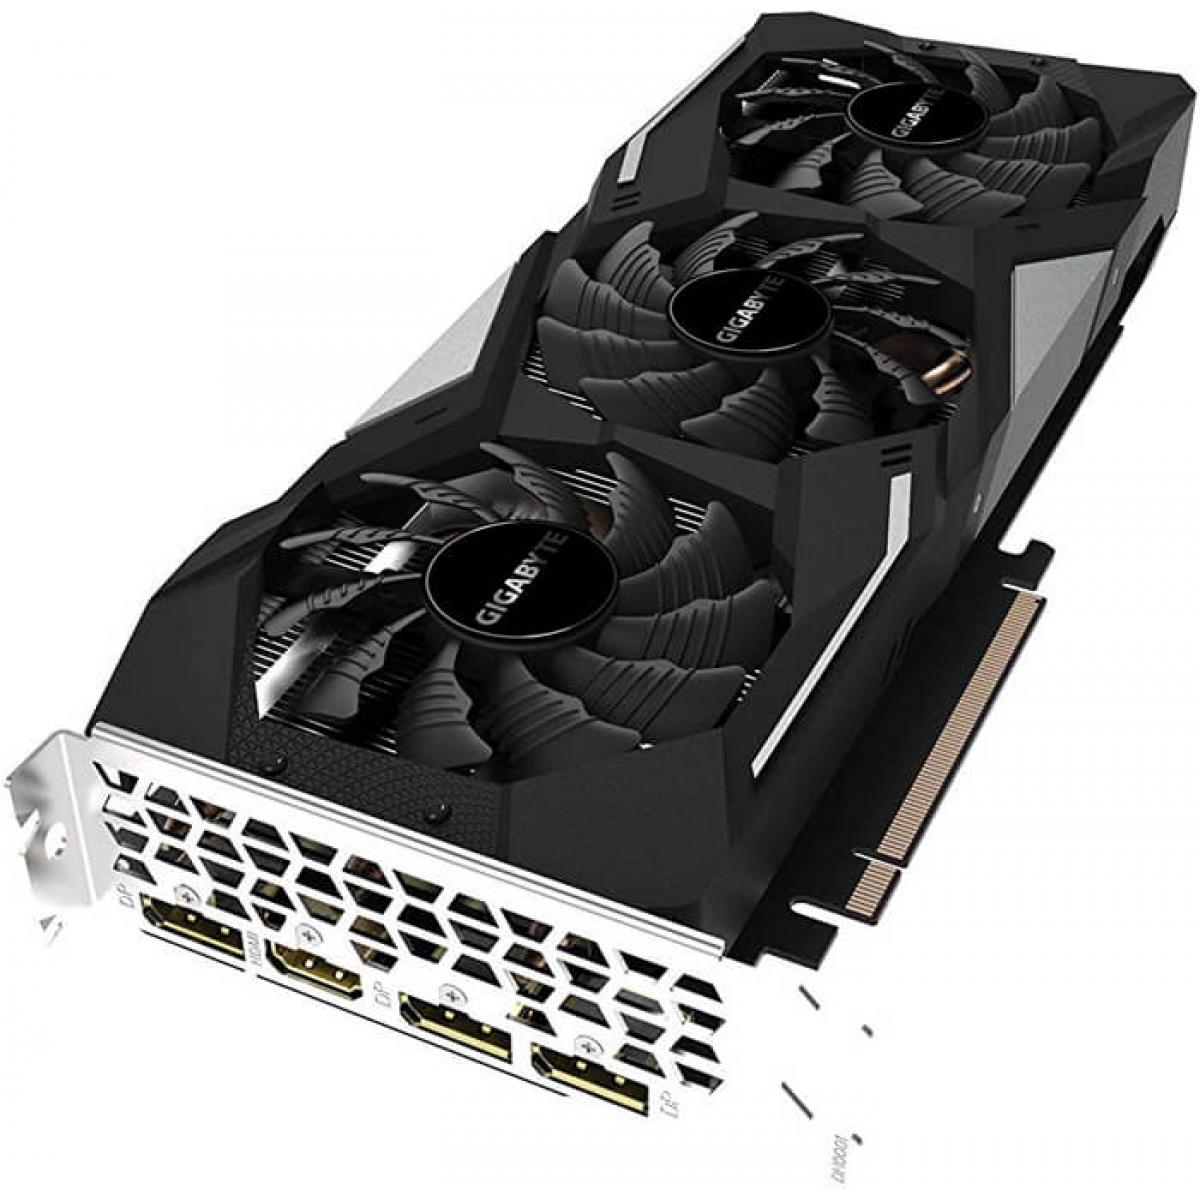 Placa de Vídeo Gigabyte GeForce GTX 1660 Ti Gaming OC, 6GB GDDR6, 192Bit